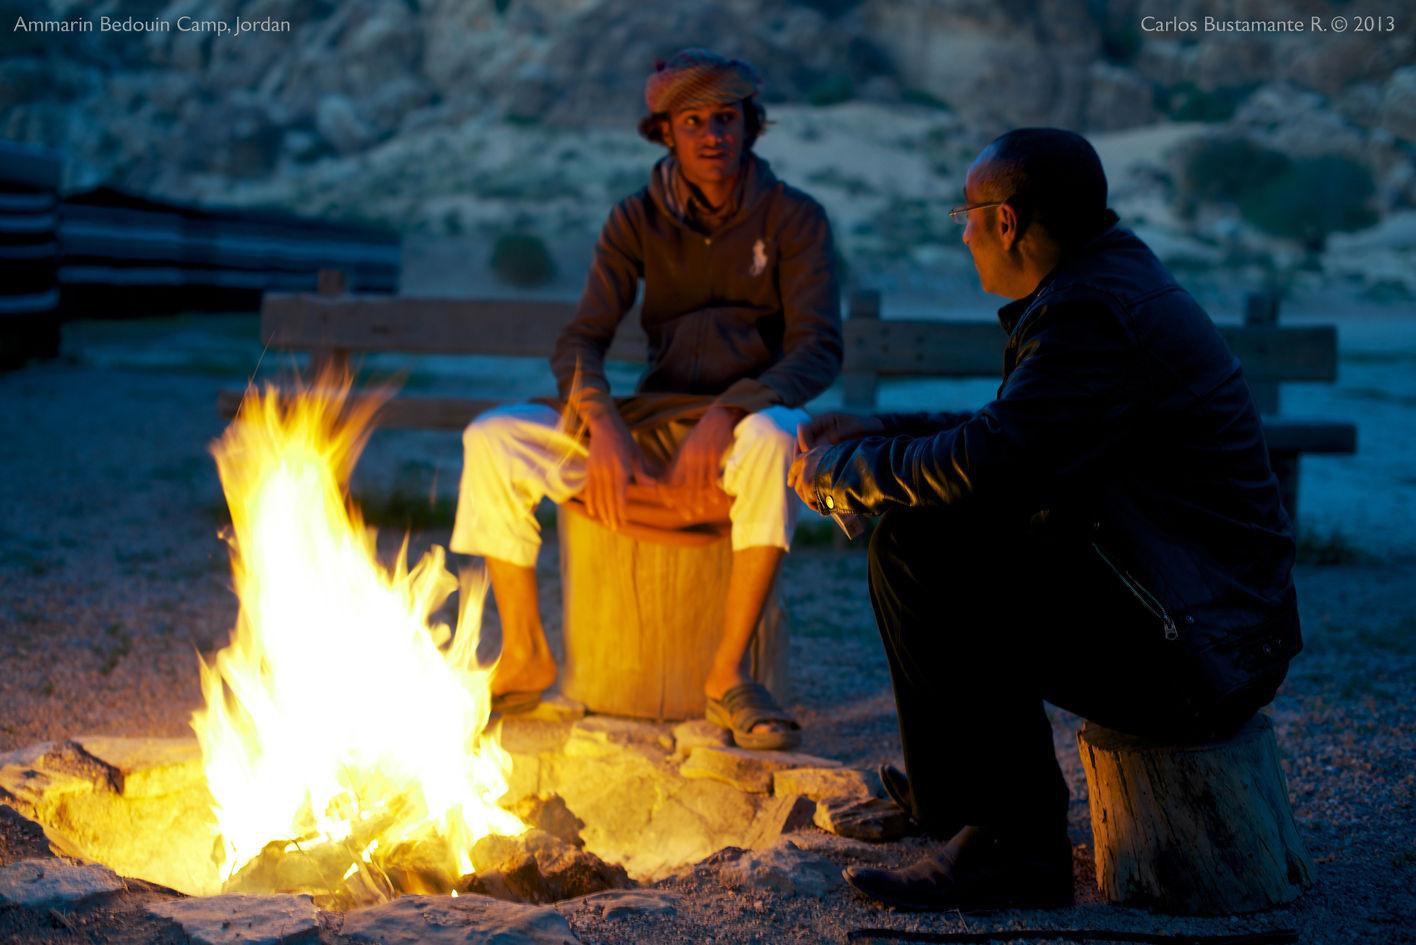 Bedouin Traditions